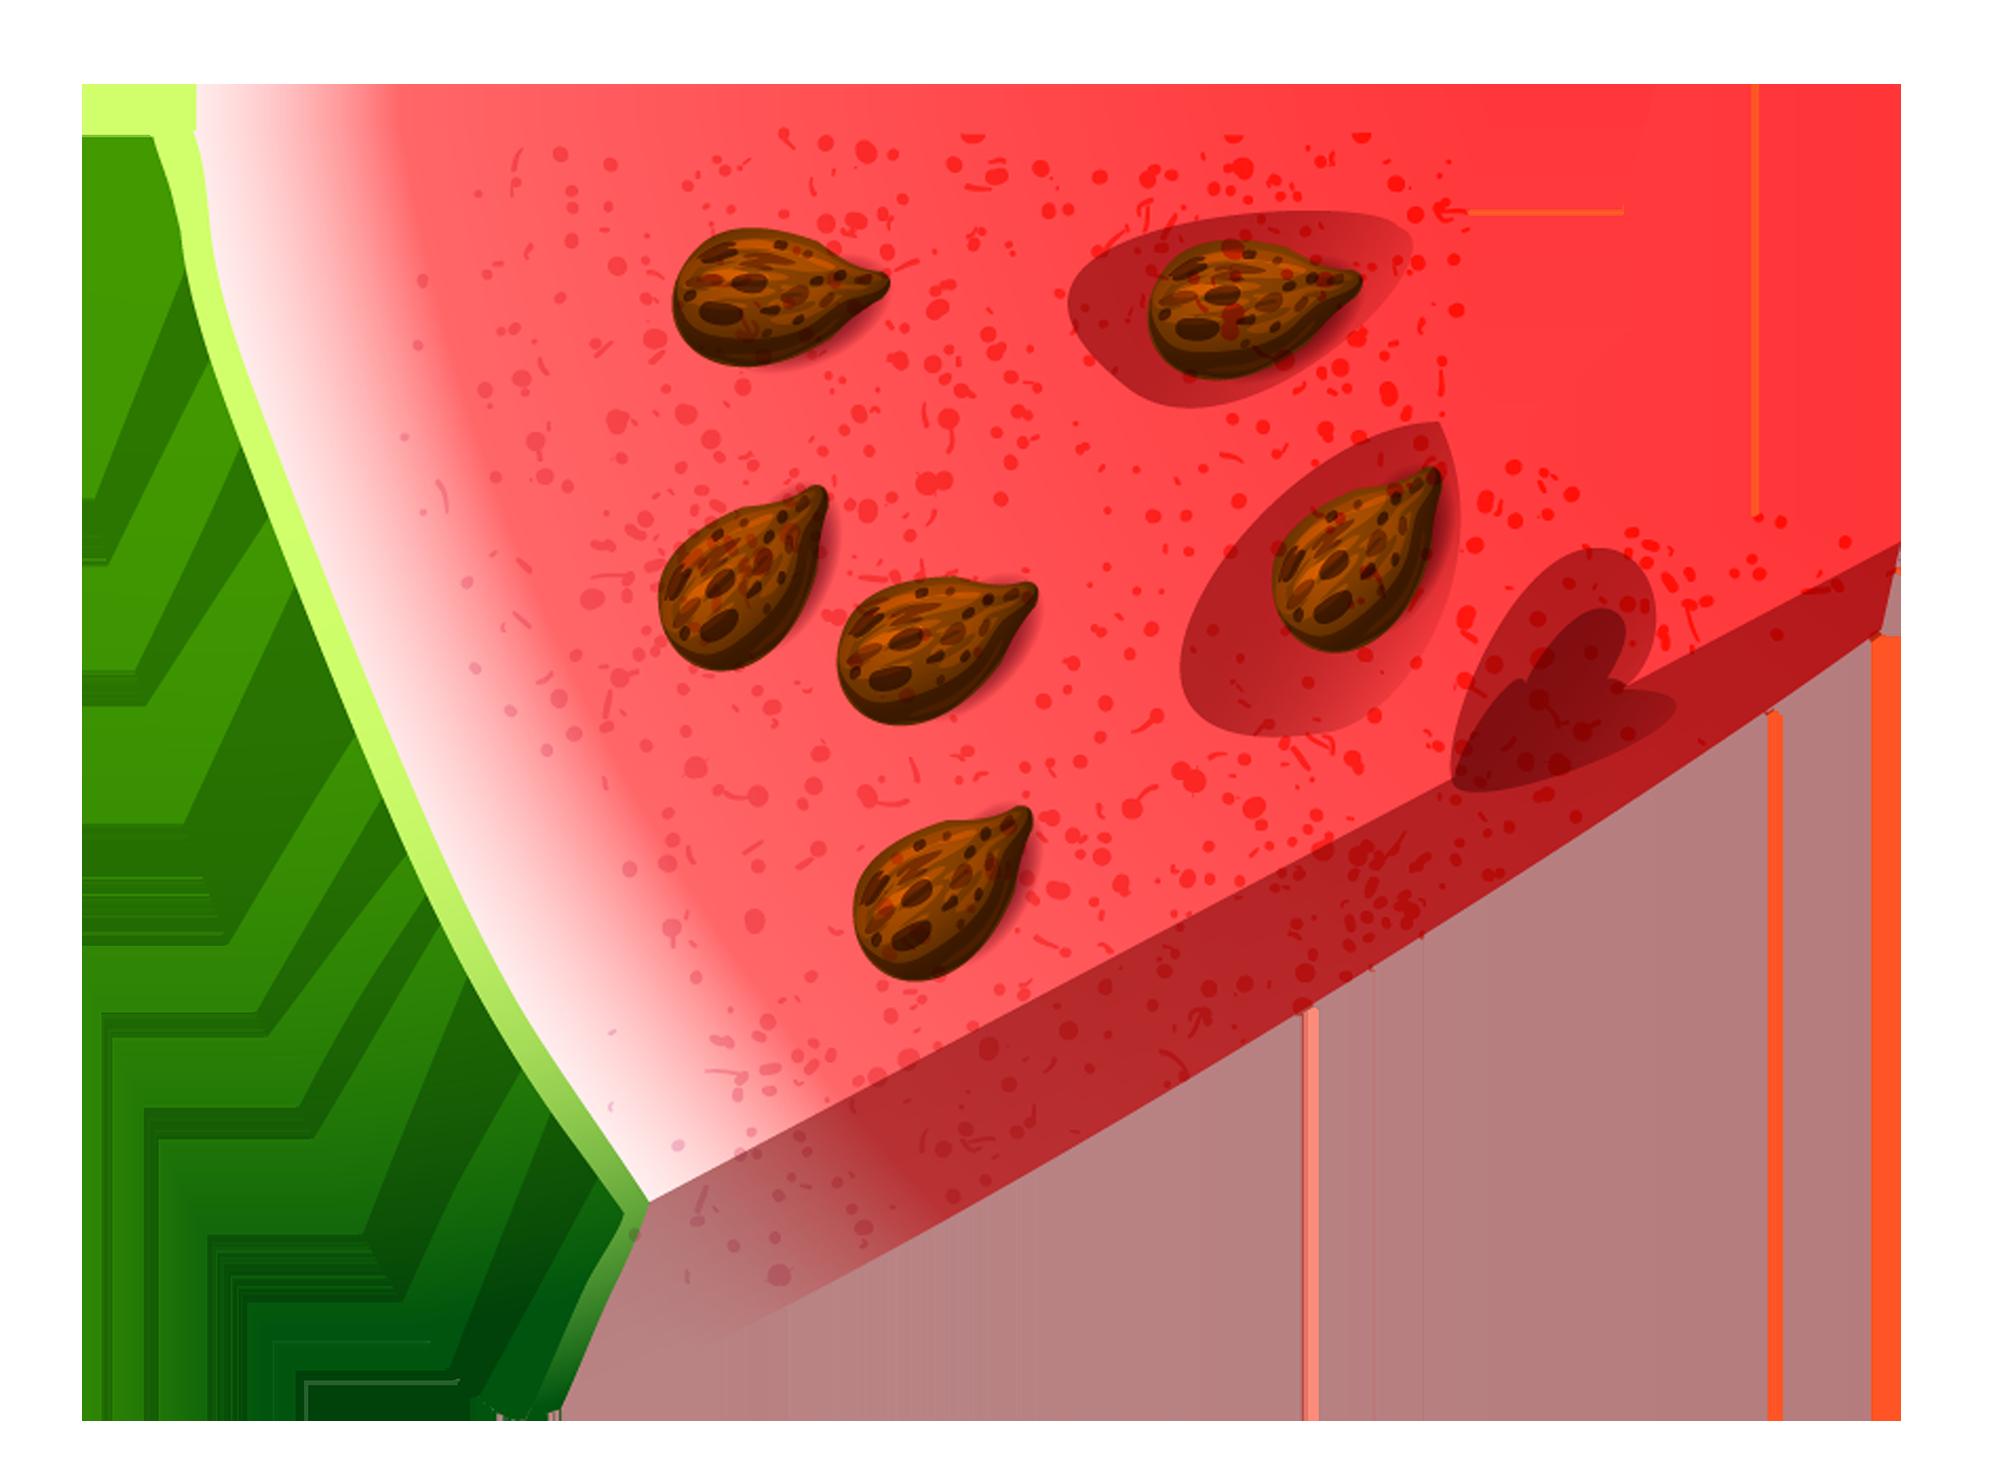 Cookies clipart bitten food. Piece of watermelon png